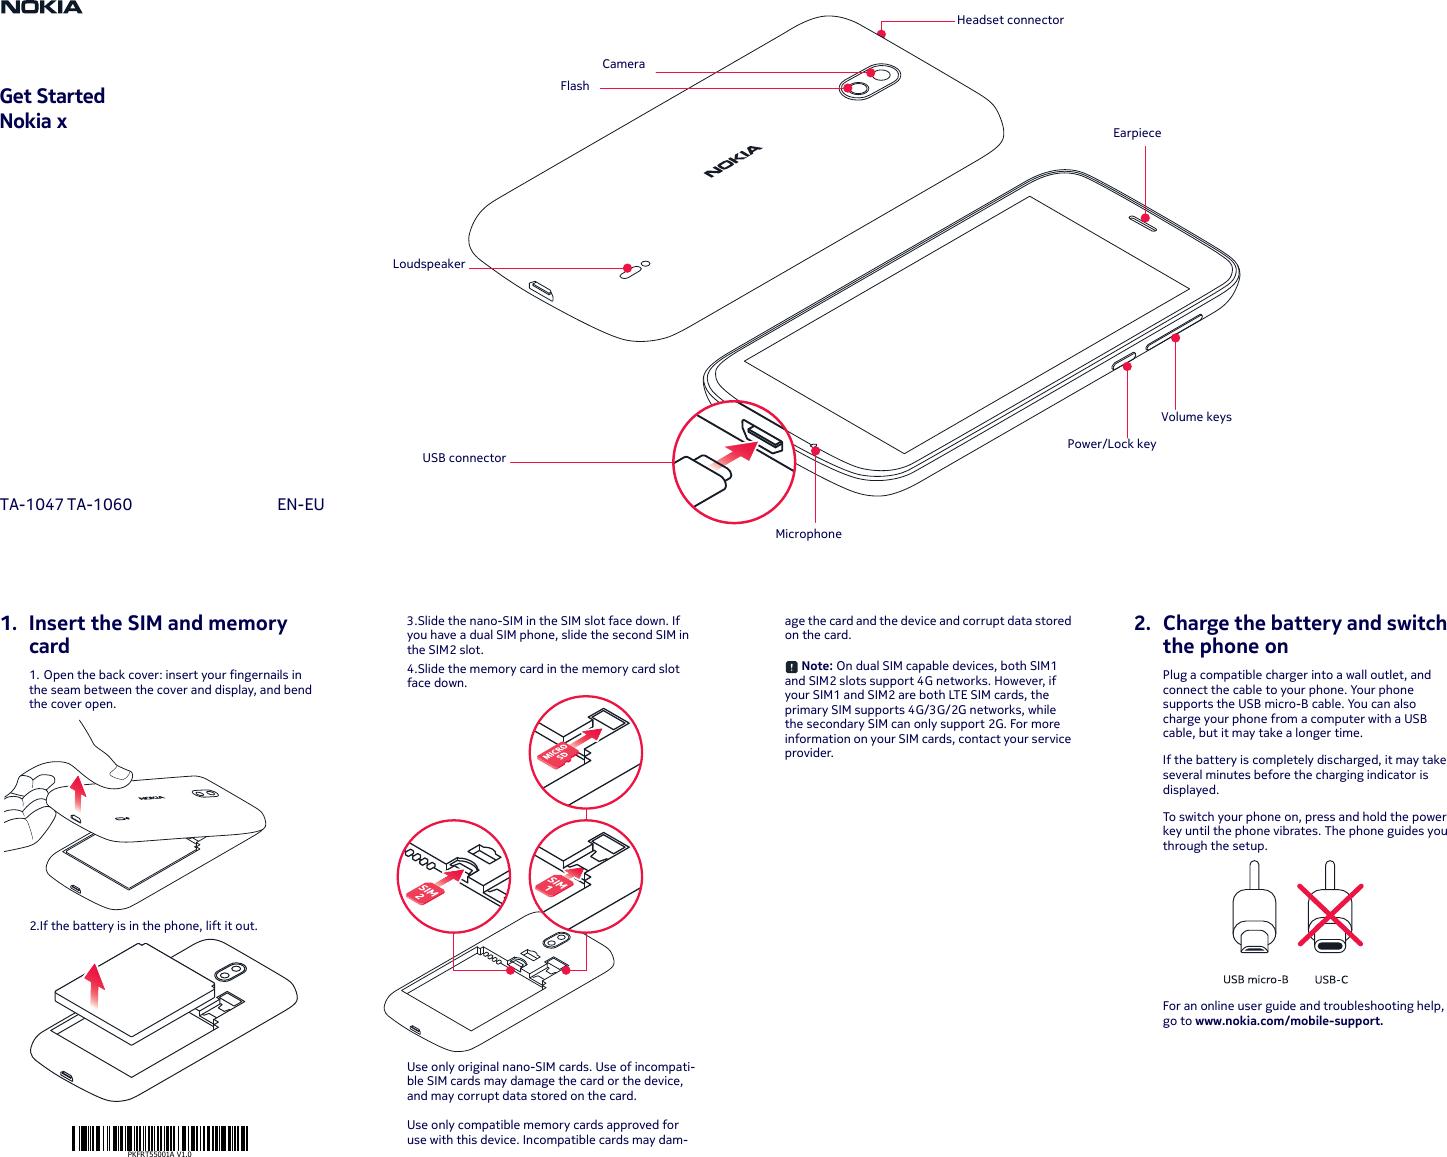 Hmd Global Ta 1047 Gsm Wcdma Lte Mobile Phone User Manual En Eu Nokia X Circuit Diagram Pkfrt55001a Nokia1 Qg Issue1